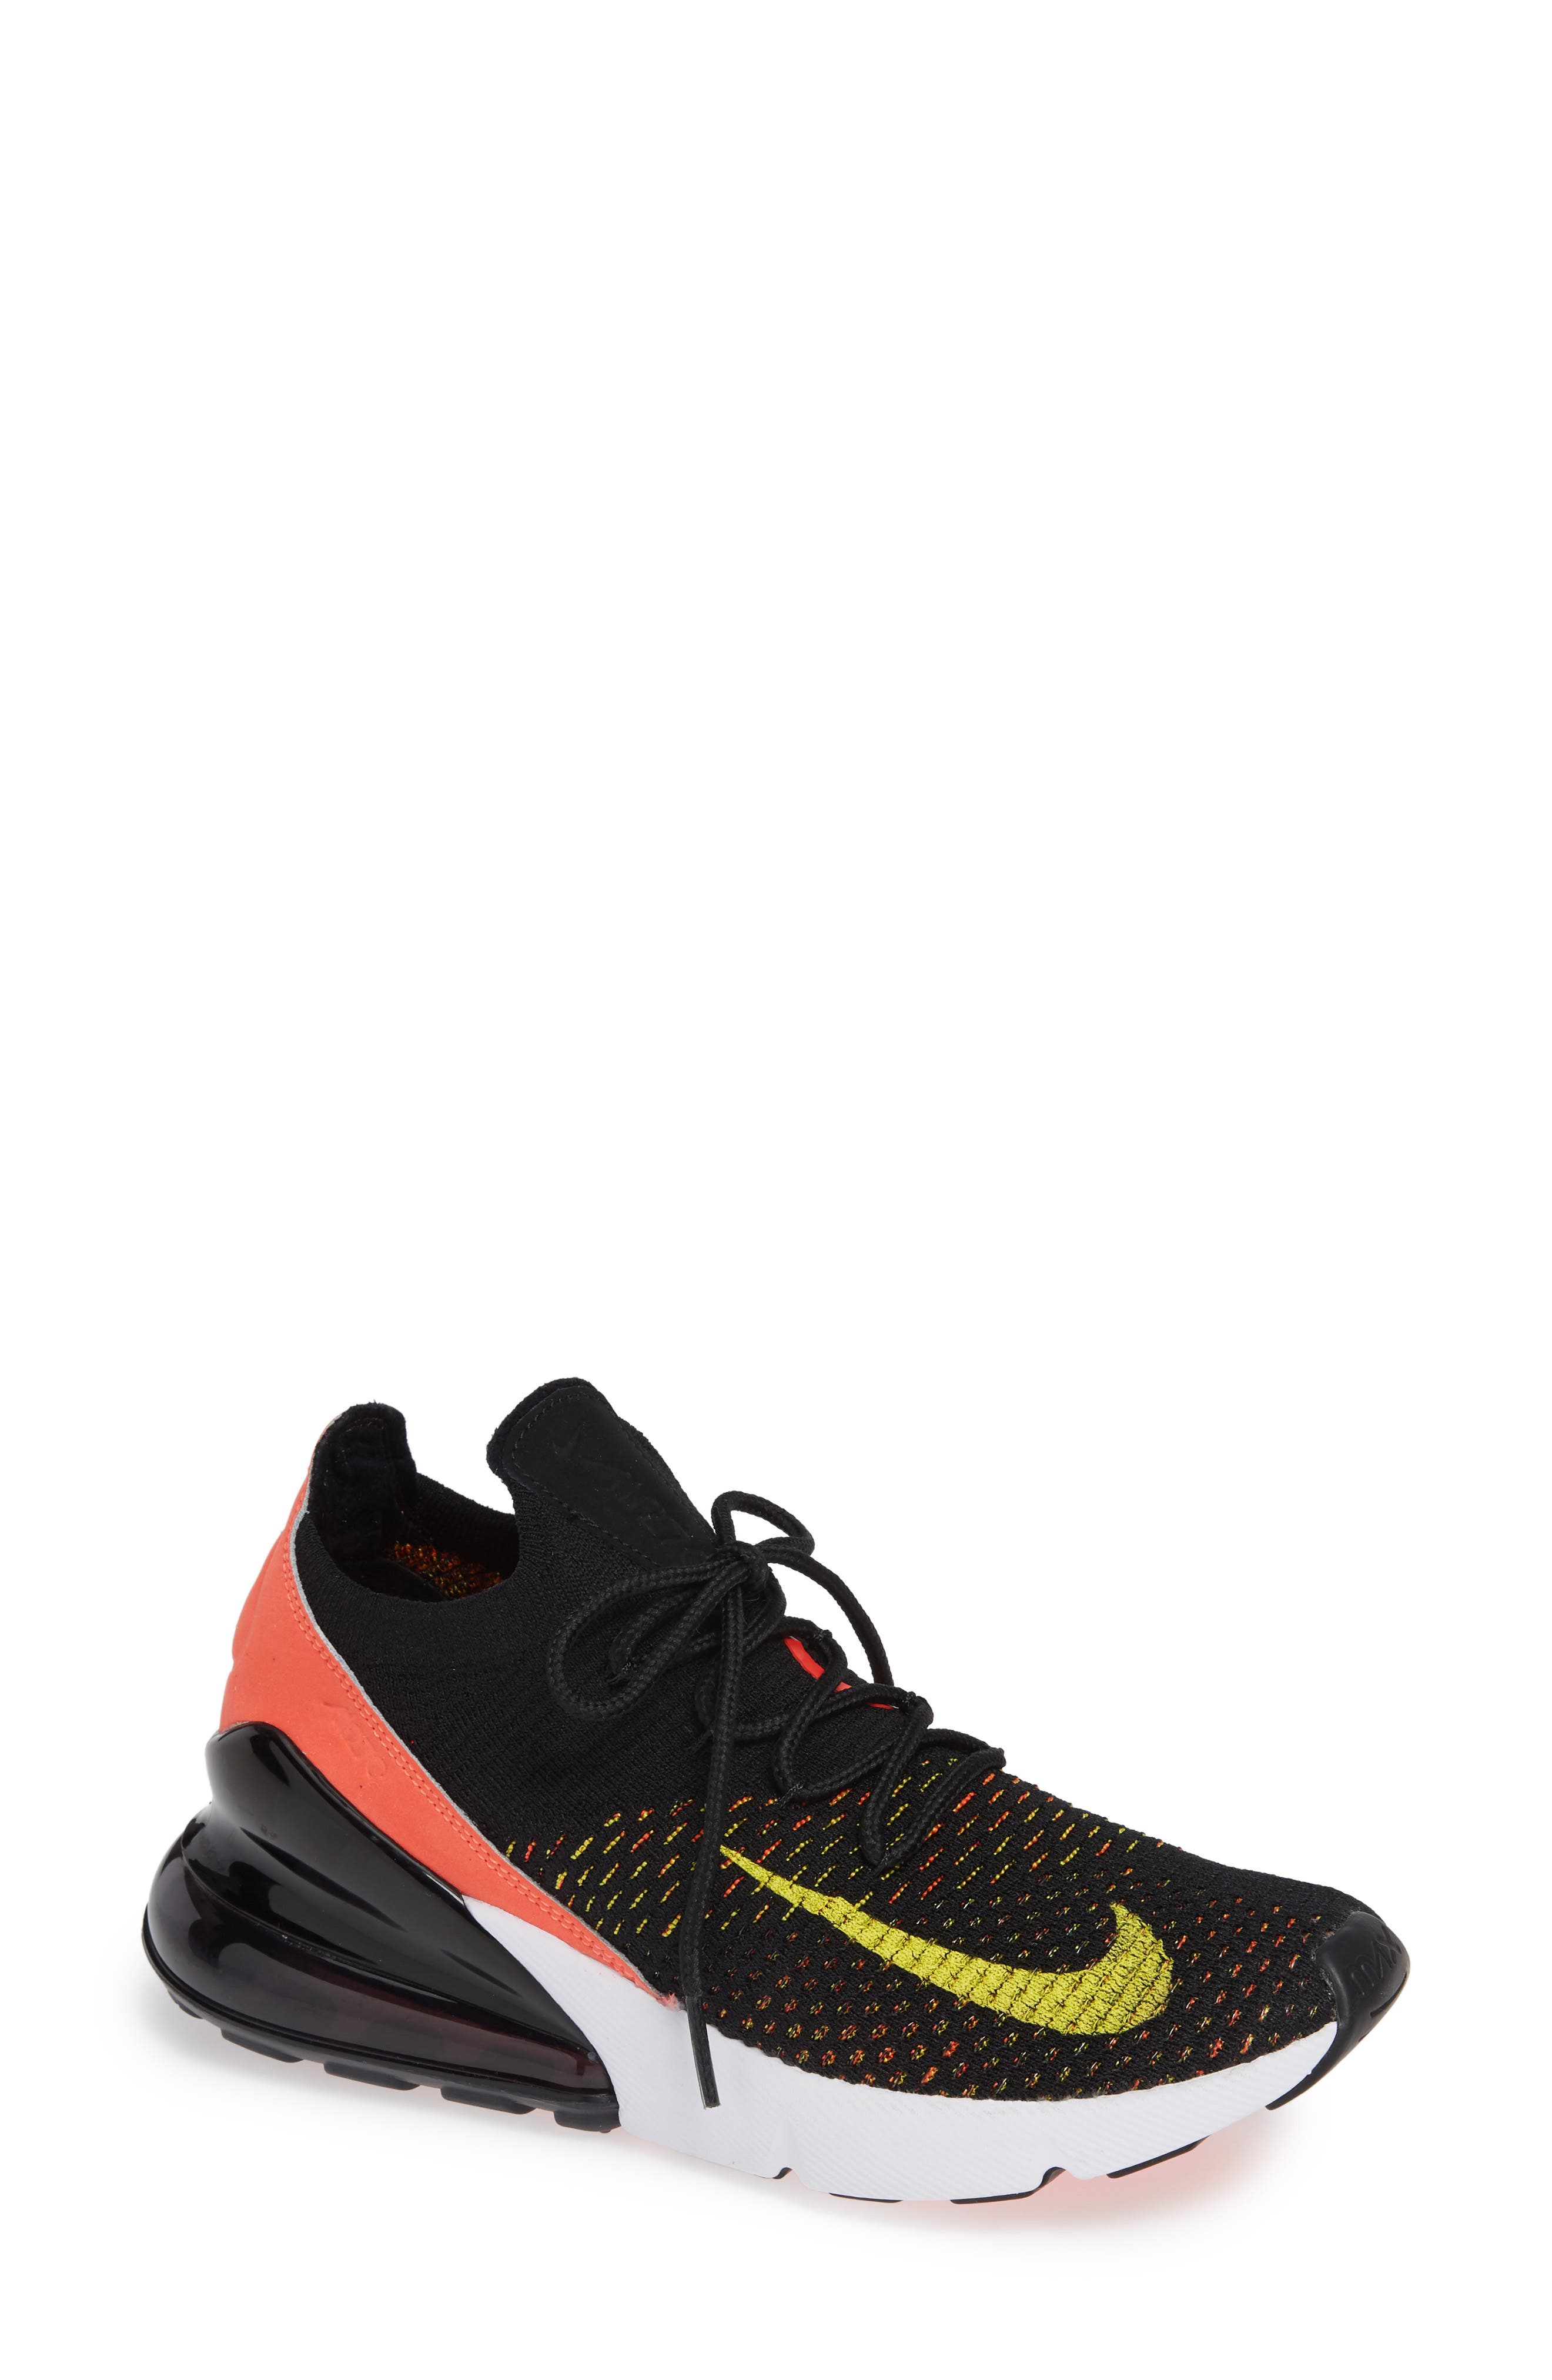 Air Max 270 Flyknit Sneaker,                             Main thumbnail 1, color,                             BLACK/ YELLOW STRIKE/ CRIMSON